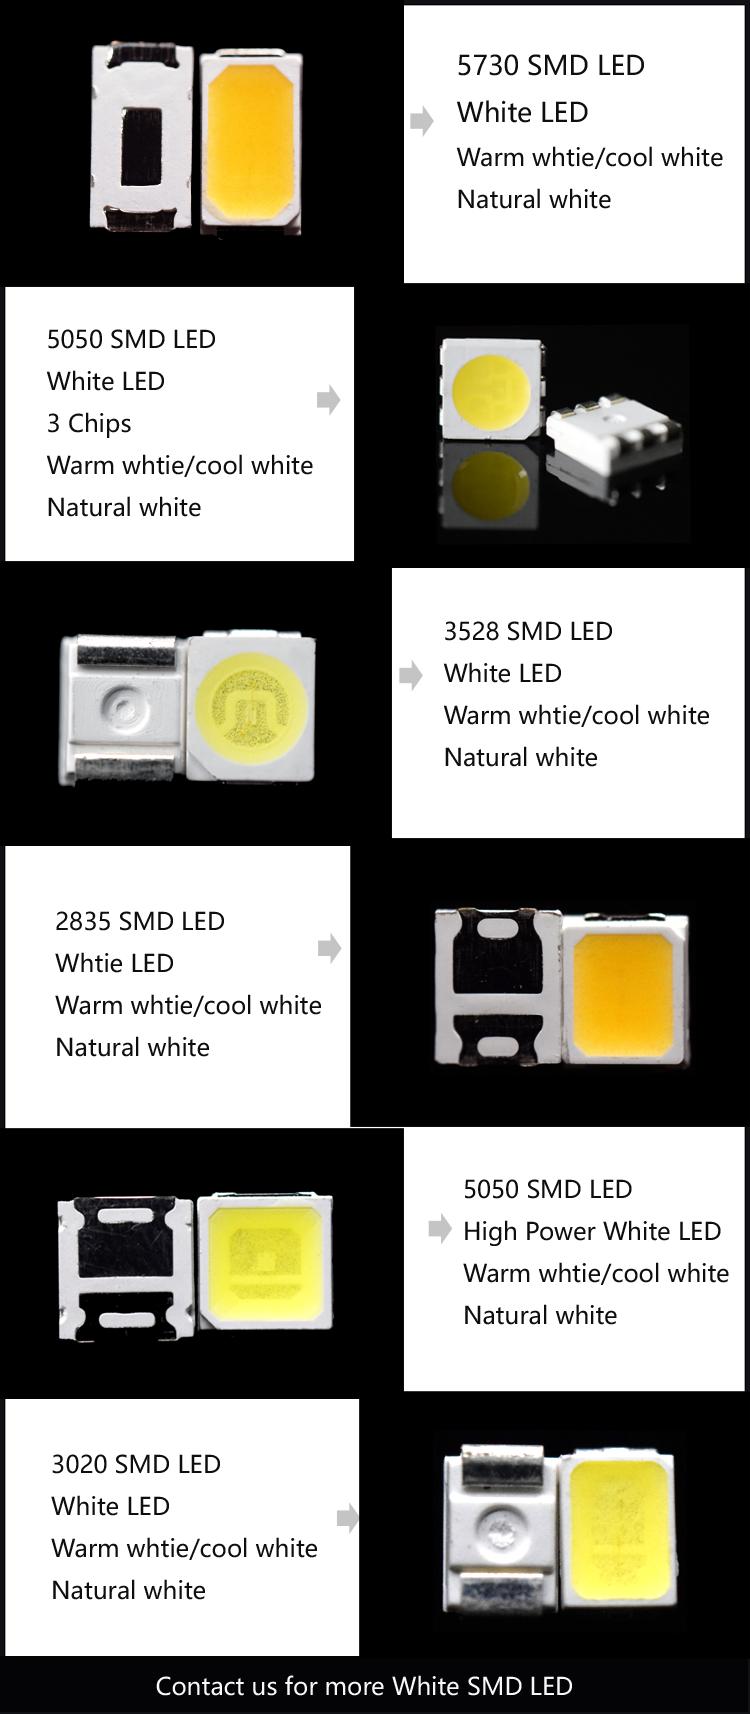 white SMD LED